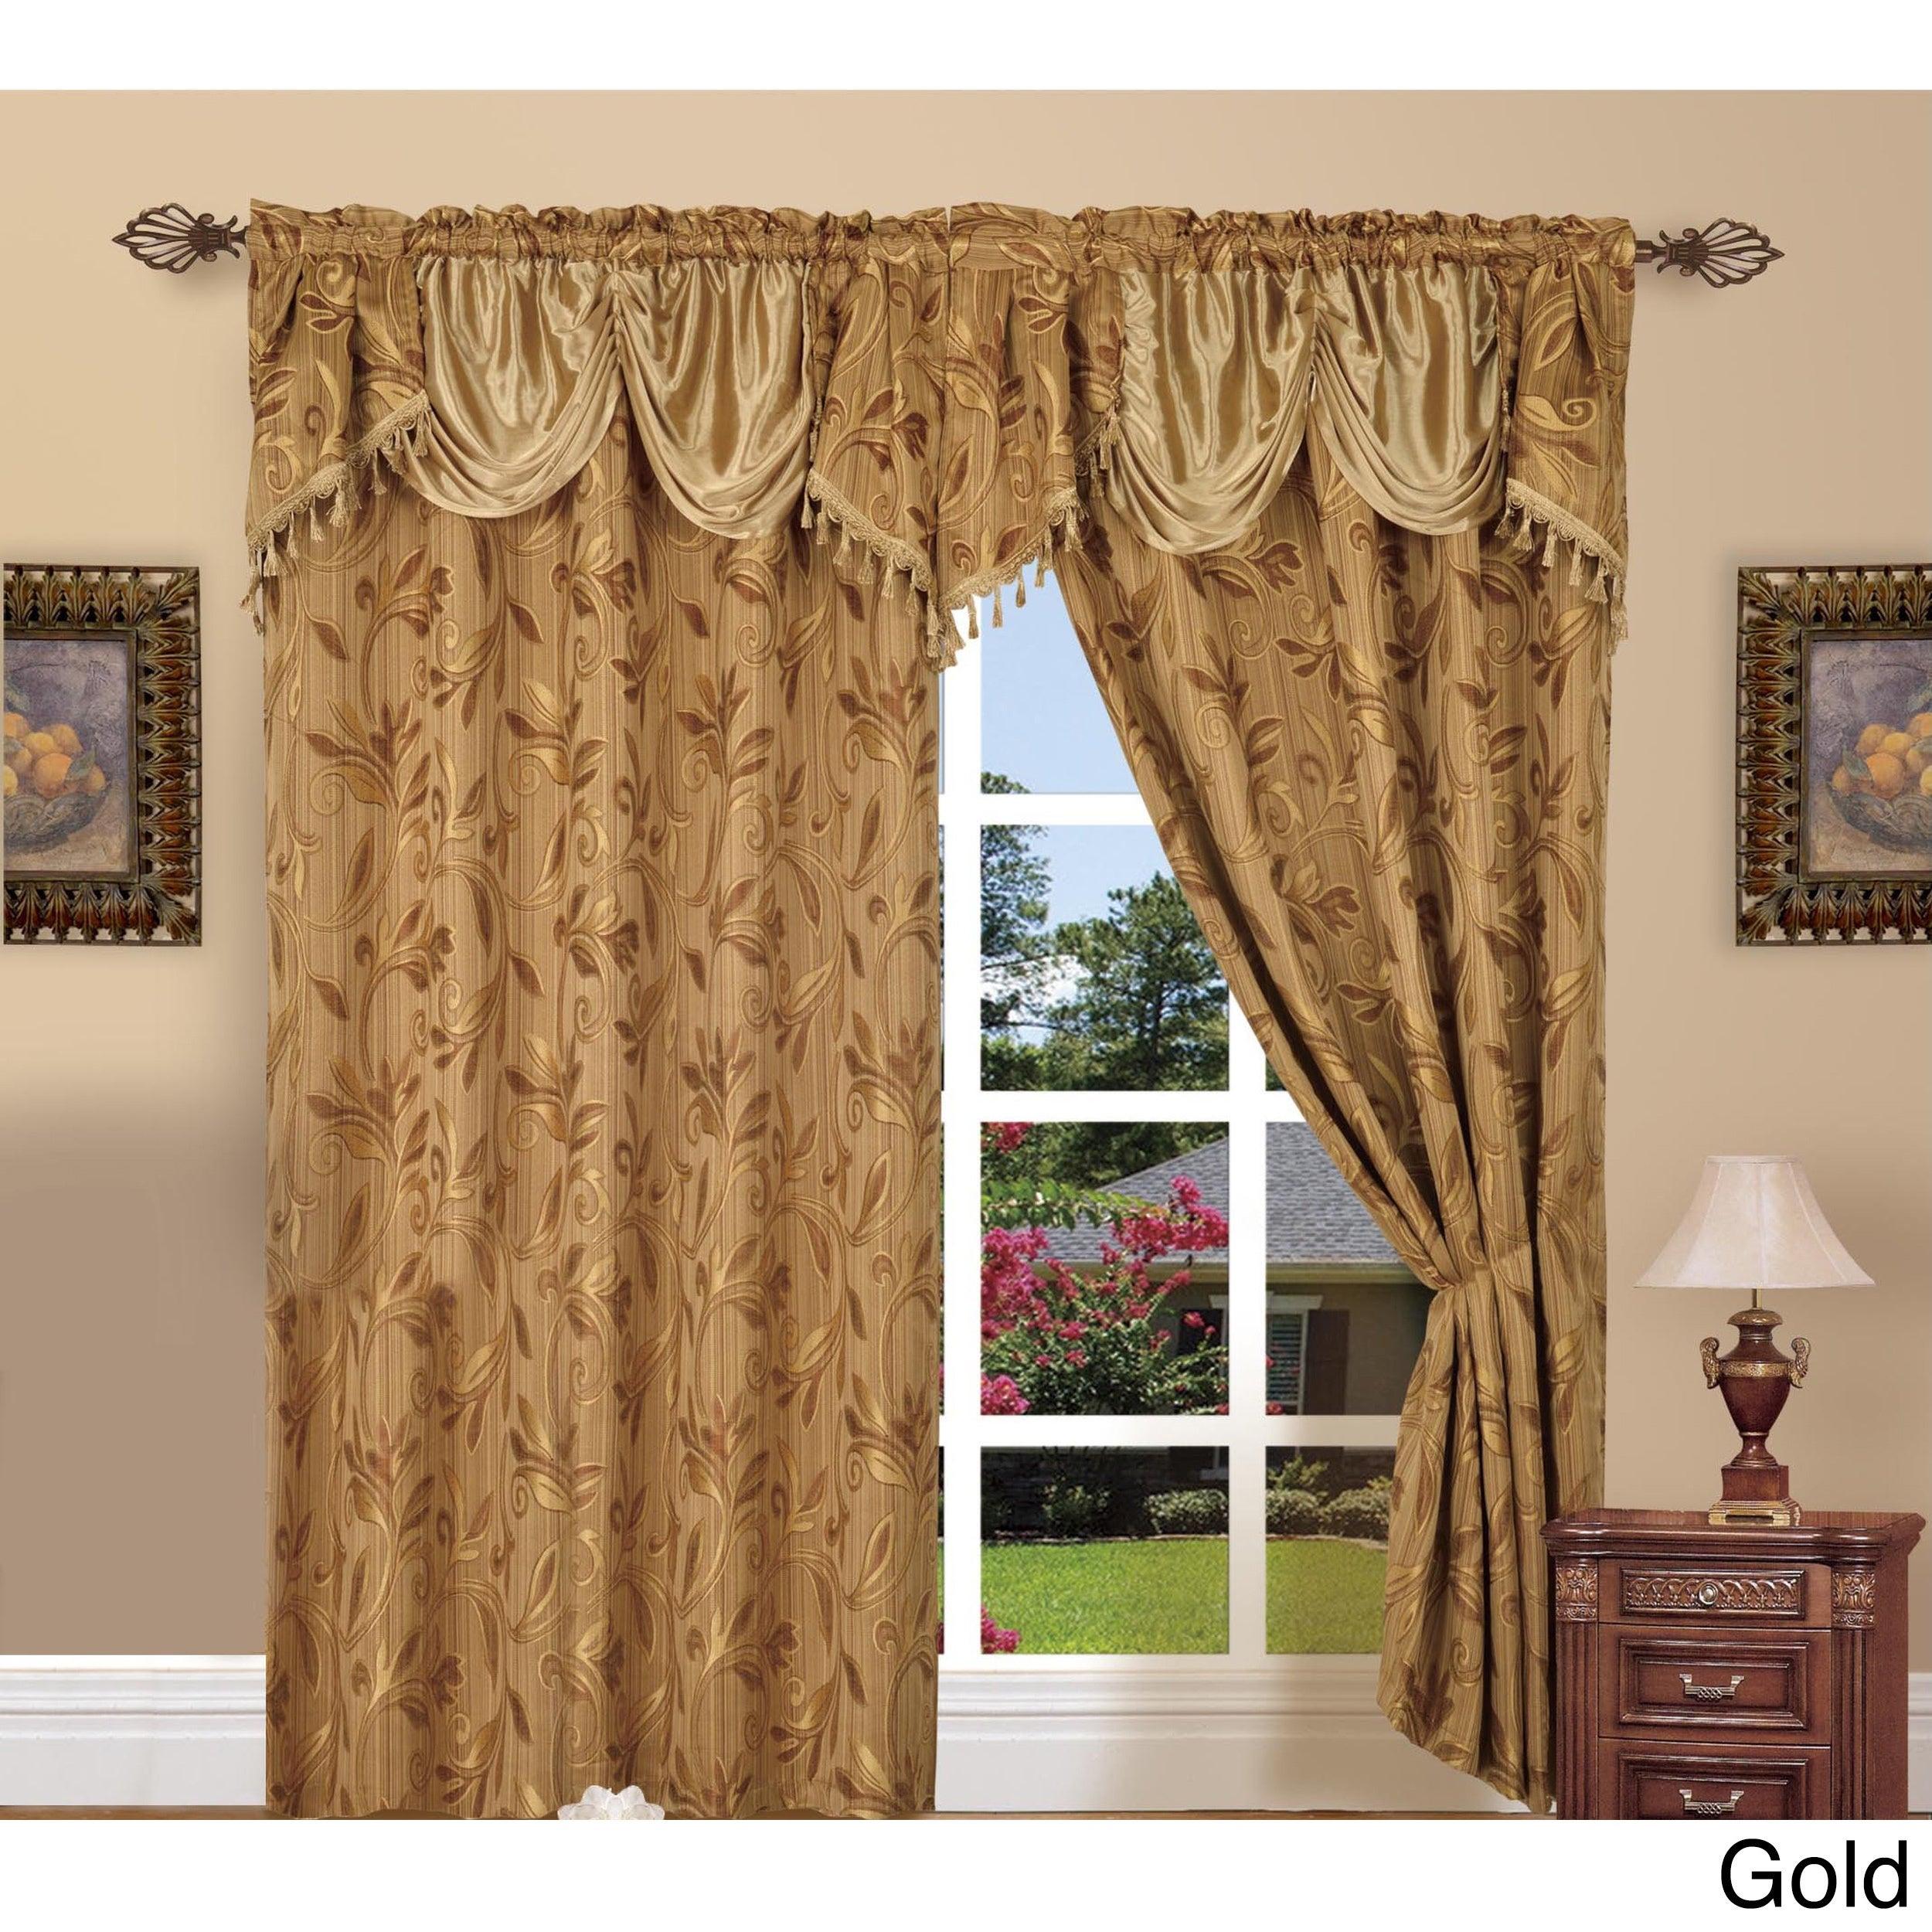 Elegant Comfort Luxury Jacquard Rod Pocket 54 Inch Window Curtain Panel Pair Within Elegant Comfort Luxury Penelopie Jacquard Window Curtain Panel Pairs (View 4 of 20)